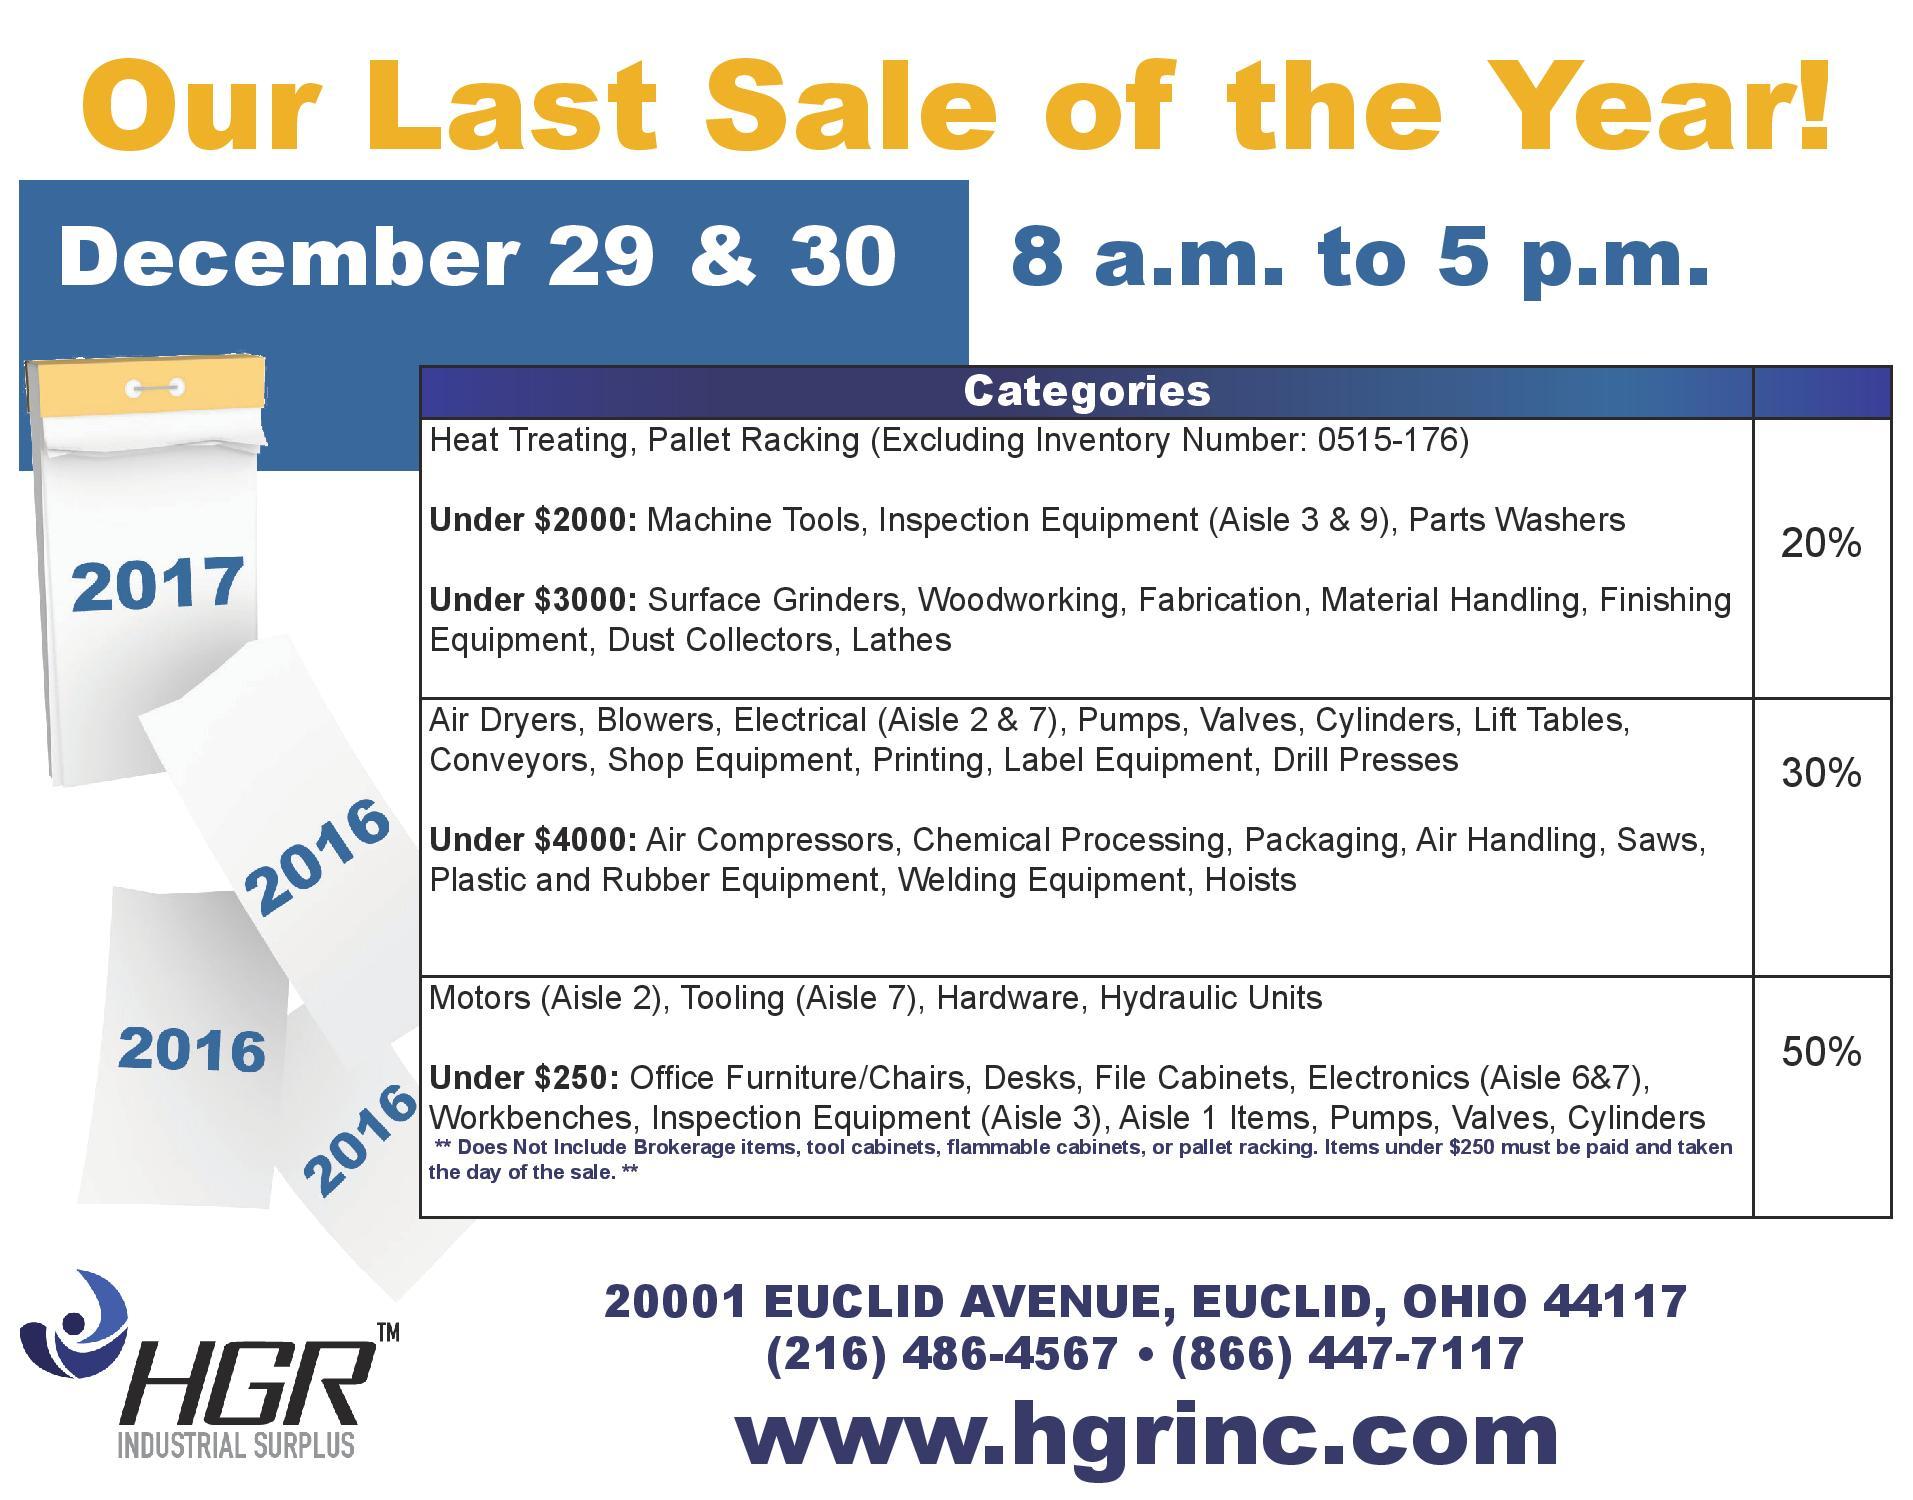 HGR's last sale of 2016